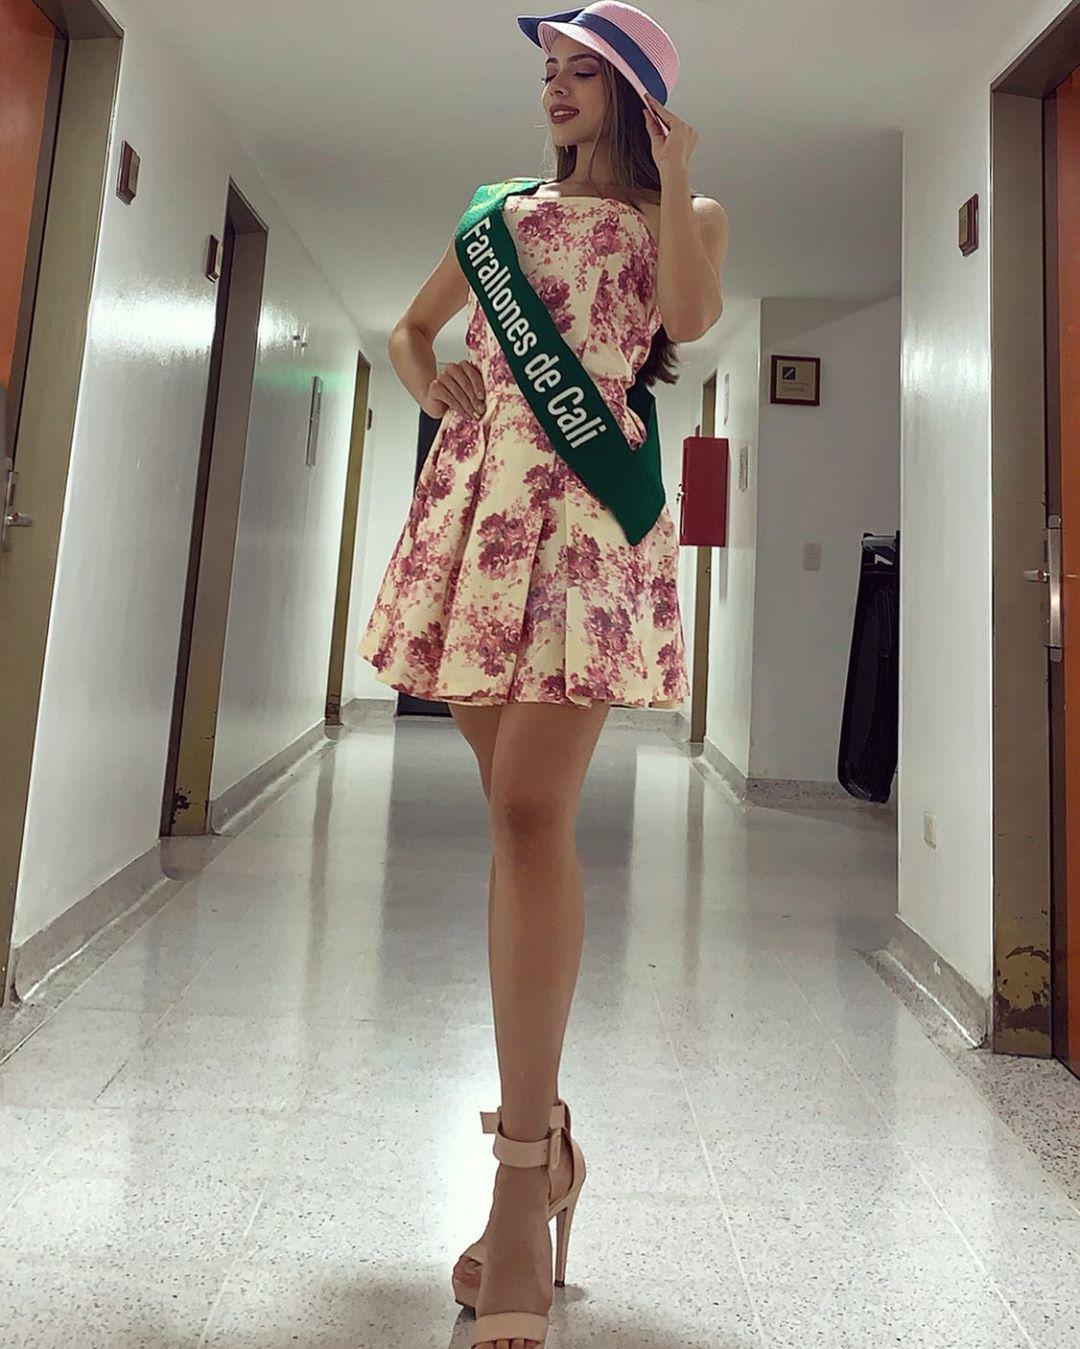 gina aguirre, virreyna de miss latinoamerica 2019. - Página 2 67573710